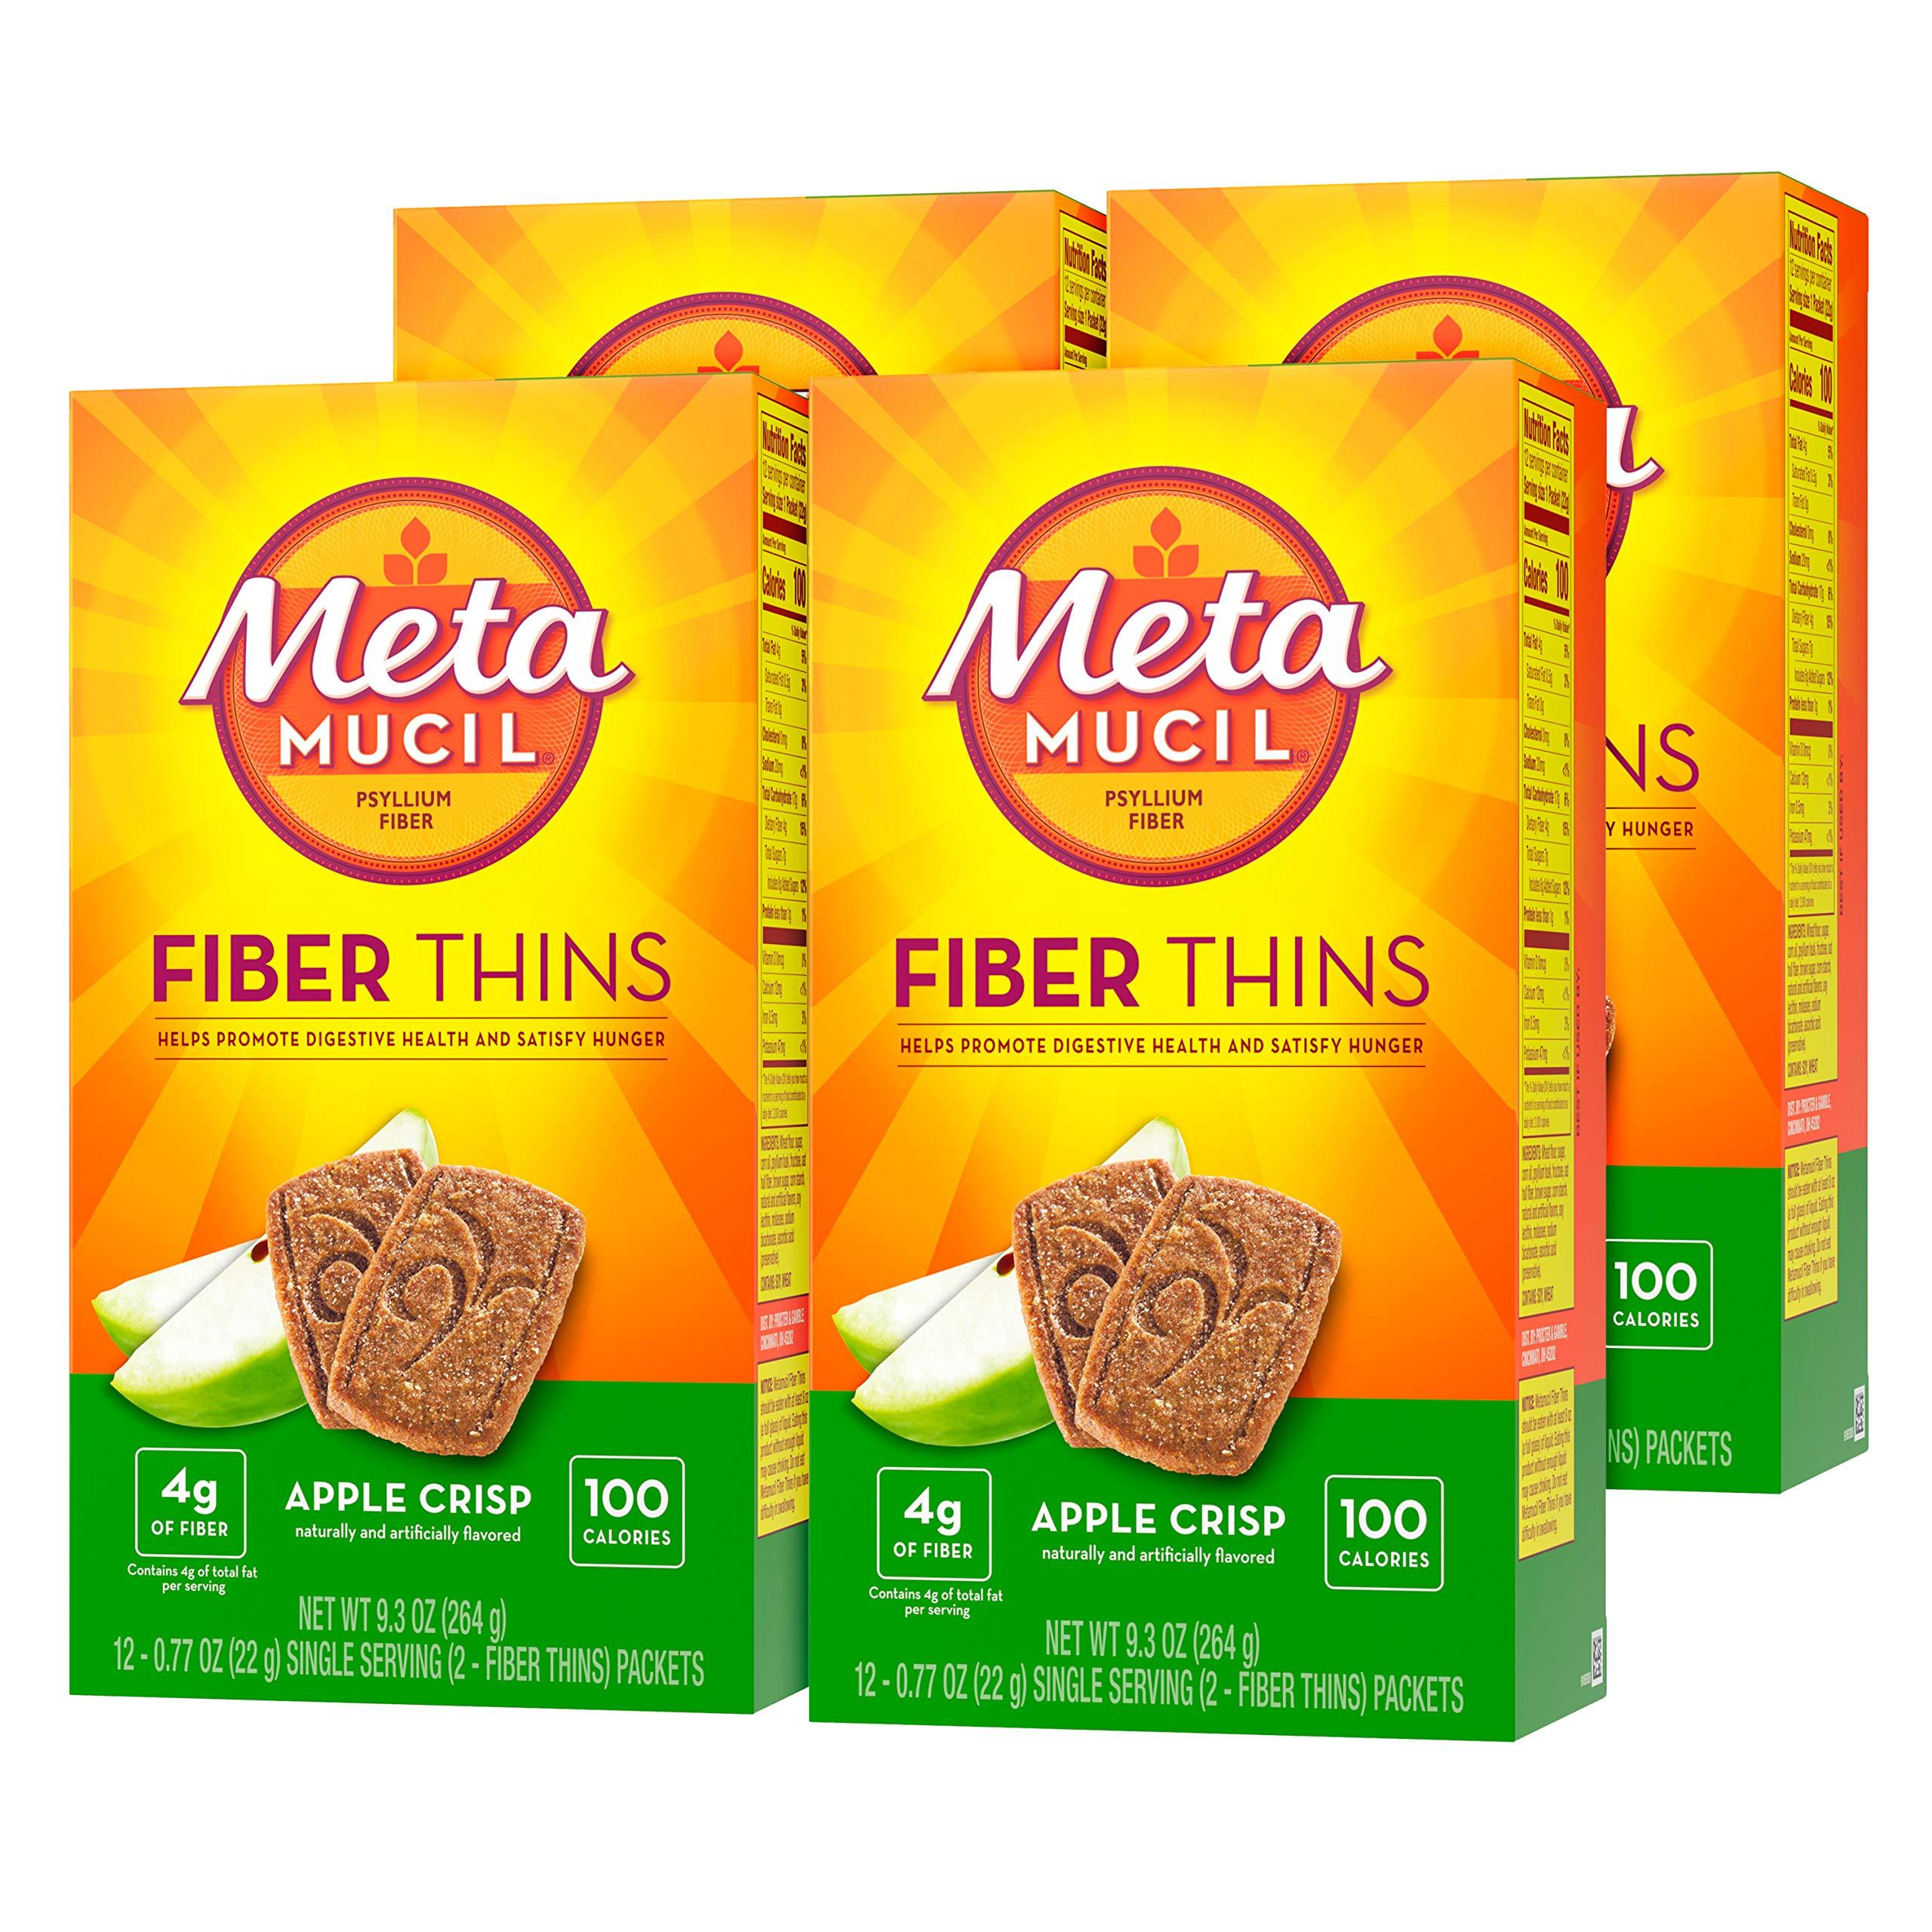 Metamucil Apple Crisp Flavored Fiber Thins Dietary Fiber Supplement with Psyllium Husk, 12 servings (pack of 4)